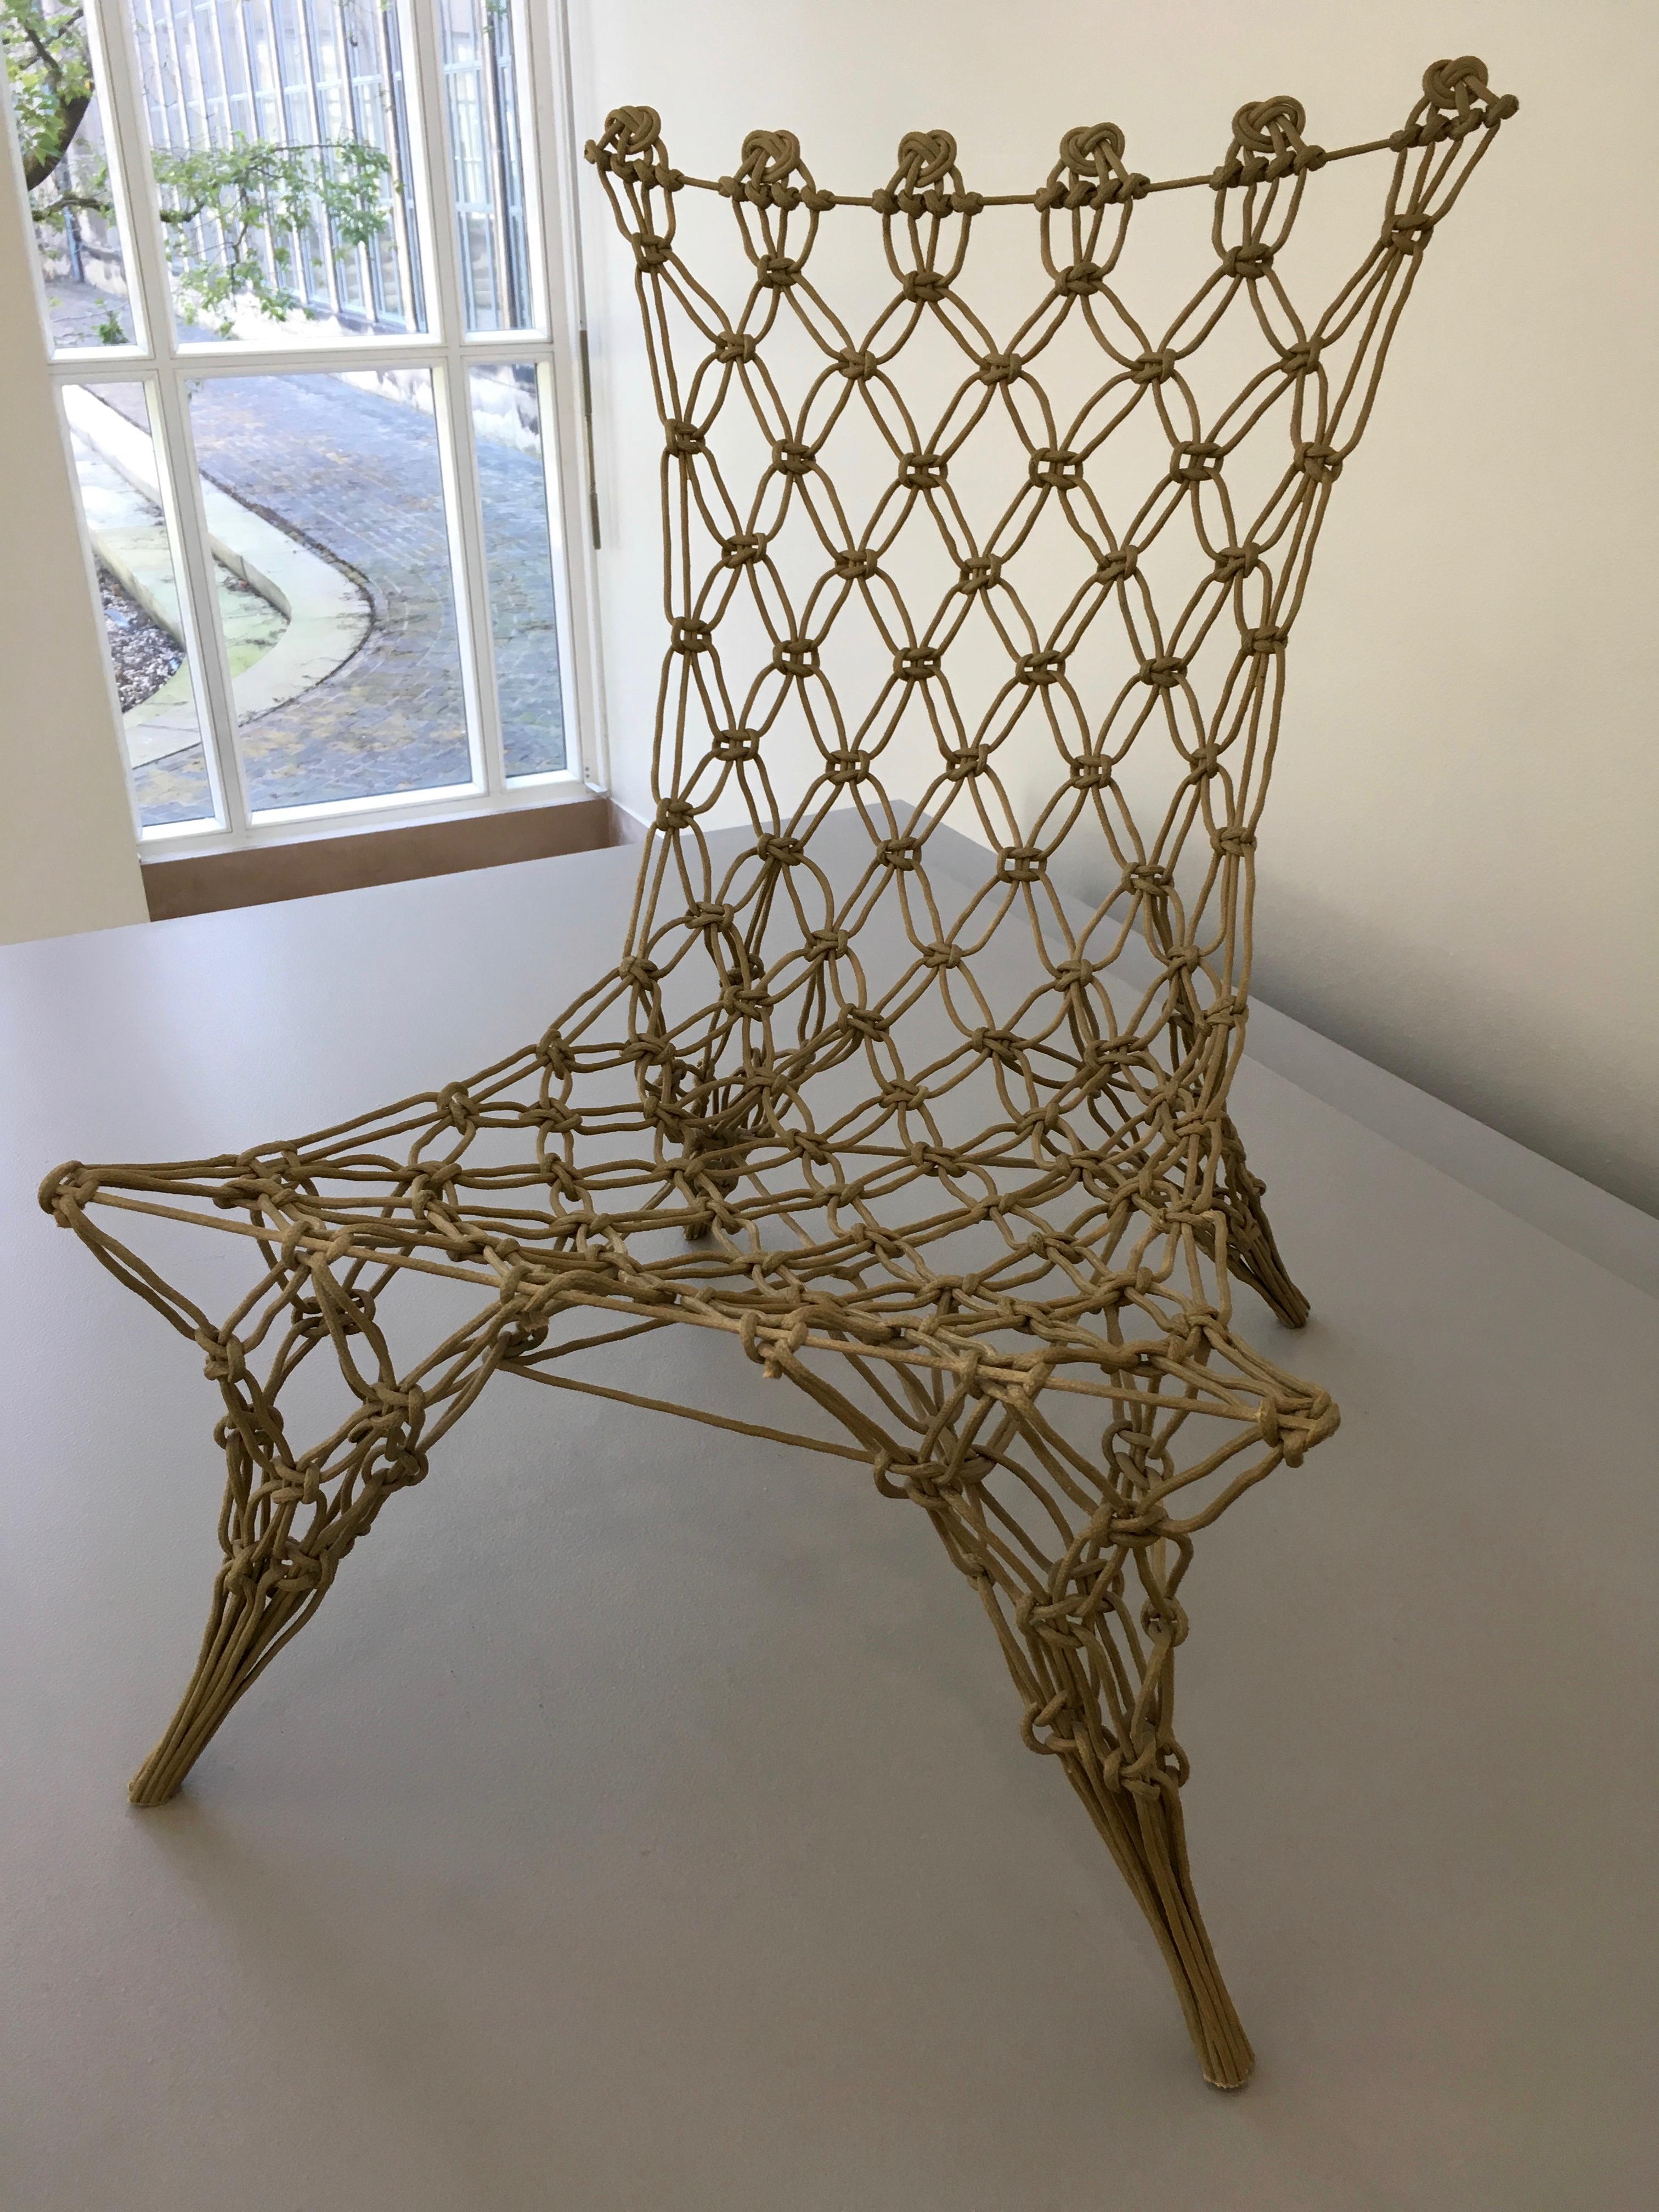 File:Marcel Wanders - Knotted Chair - 1996 - Boijmans V 1894 (KN&V).jpg